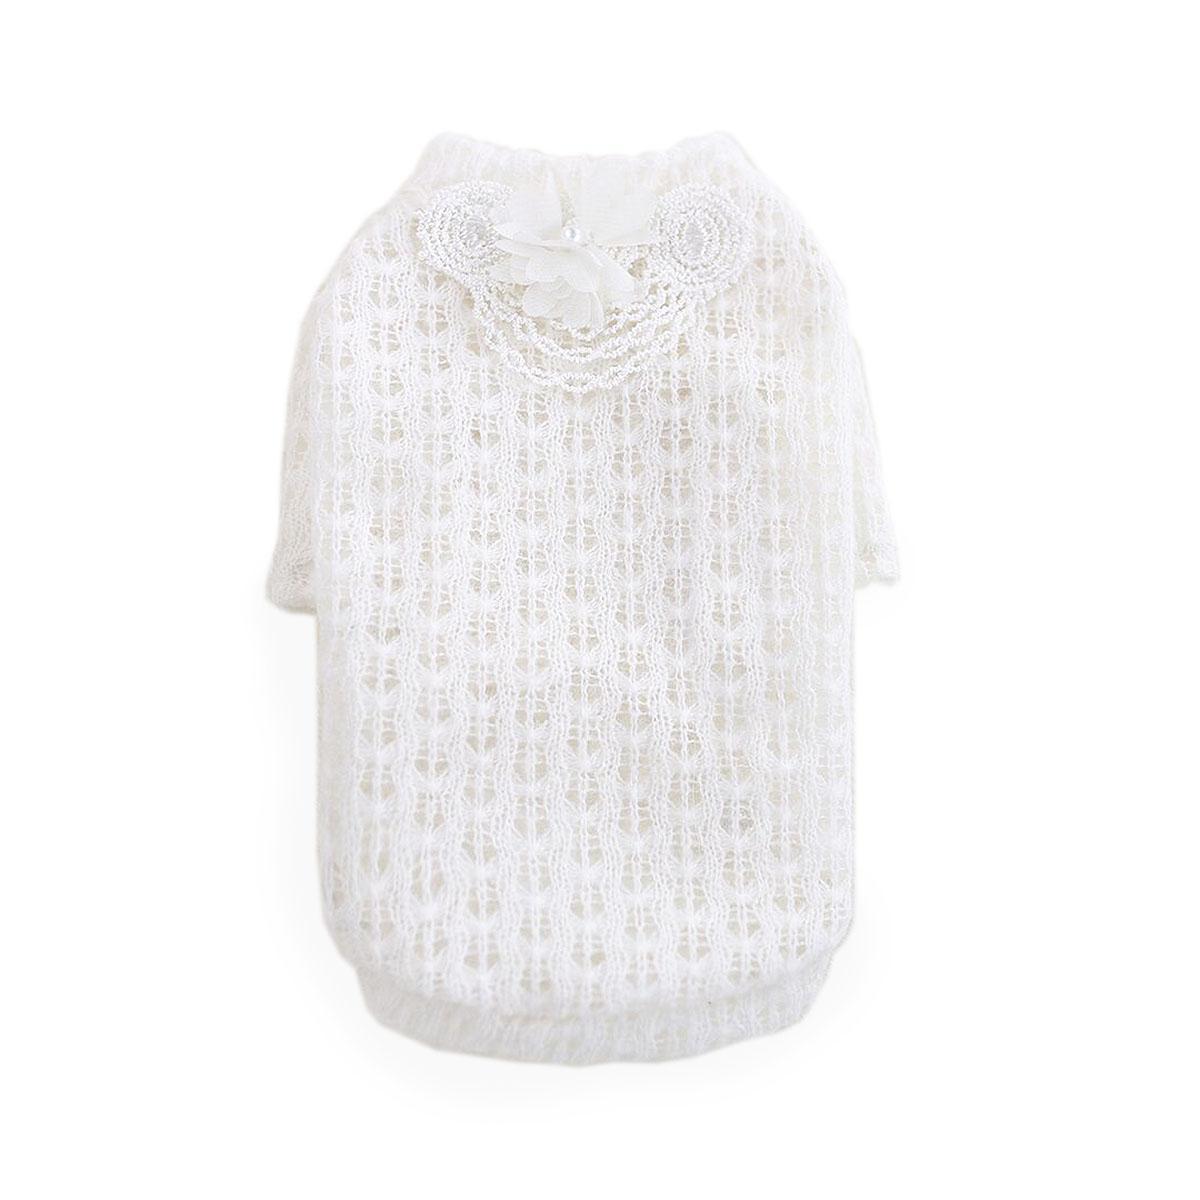 Sweet Magnolia Dog Sweater by Hello Doggie - White